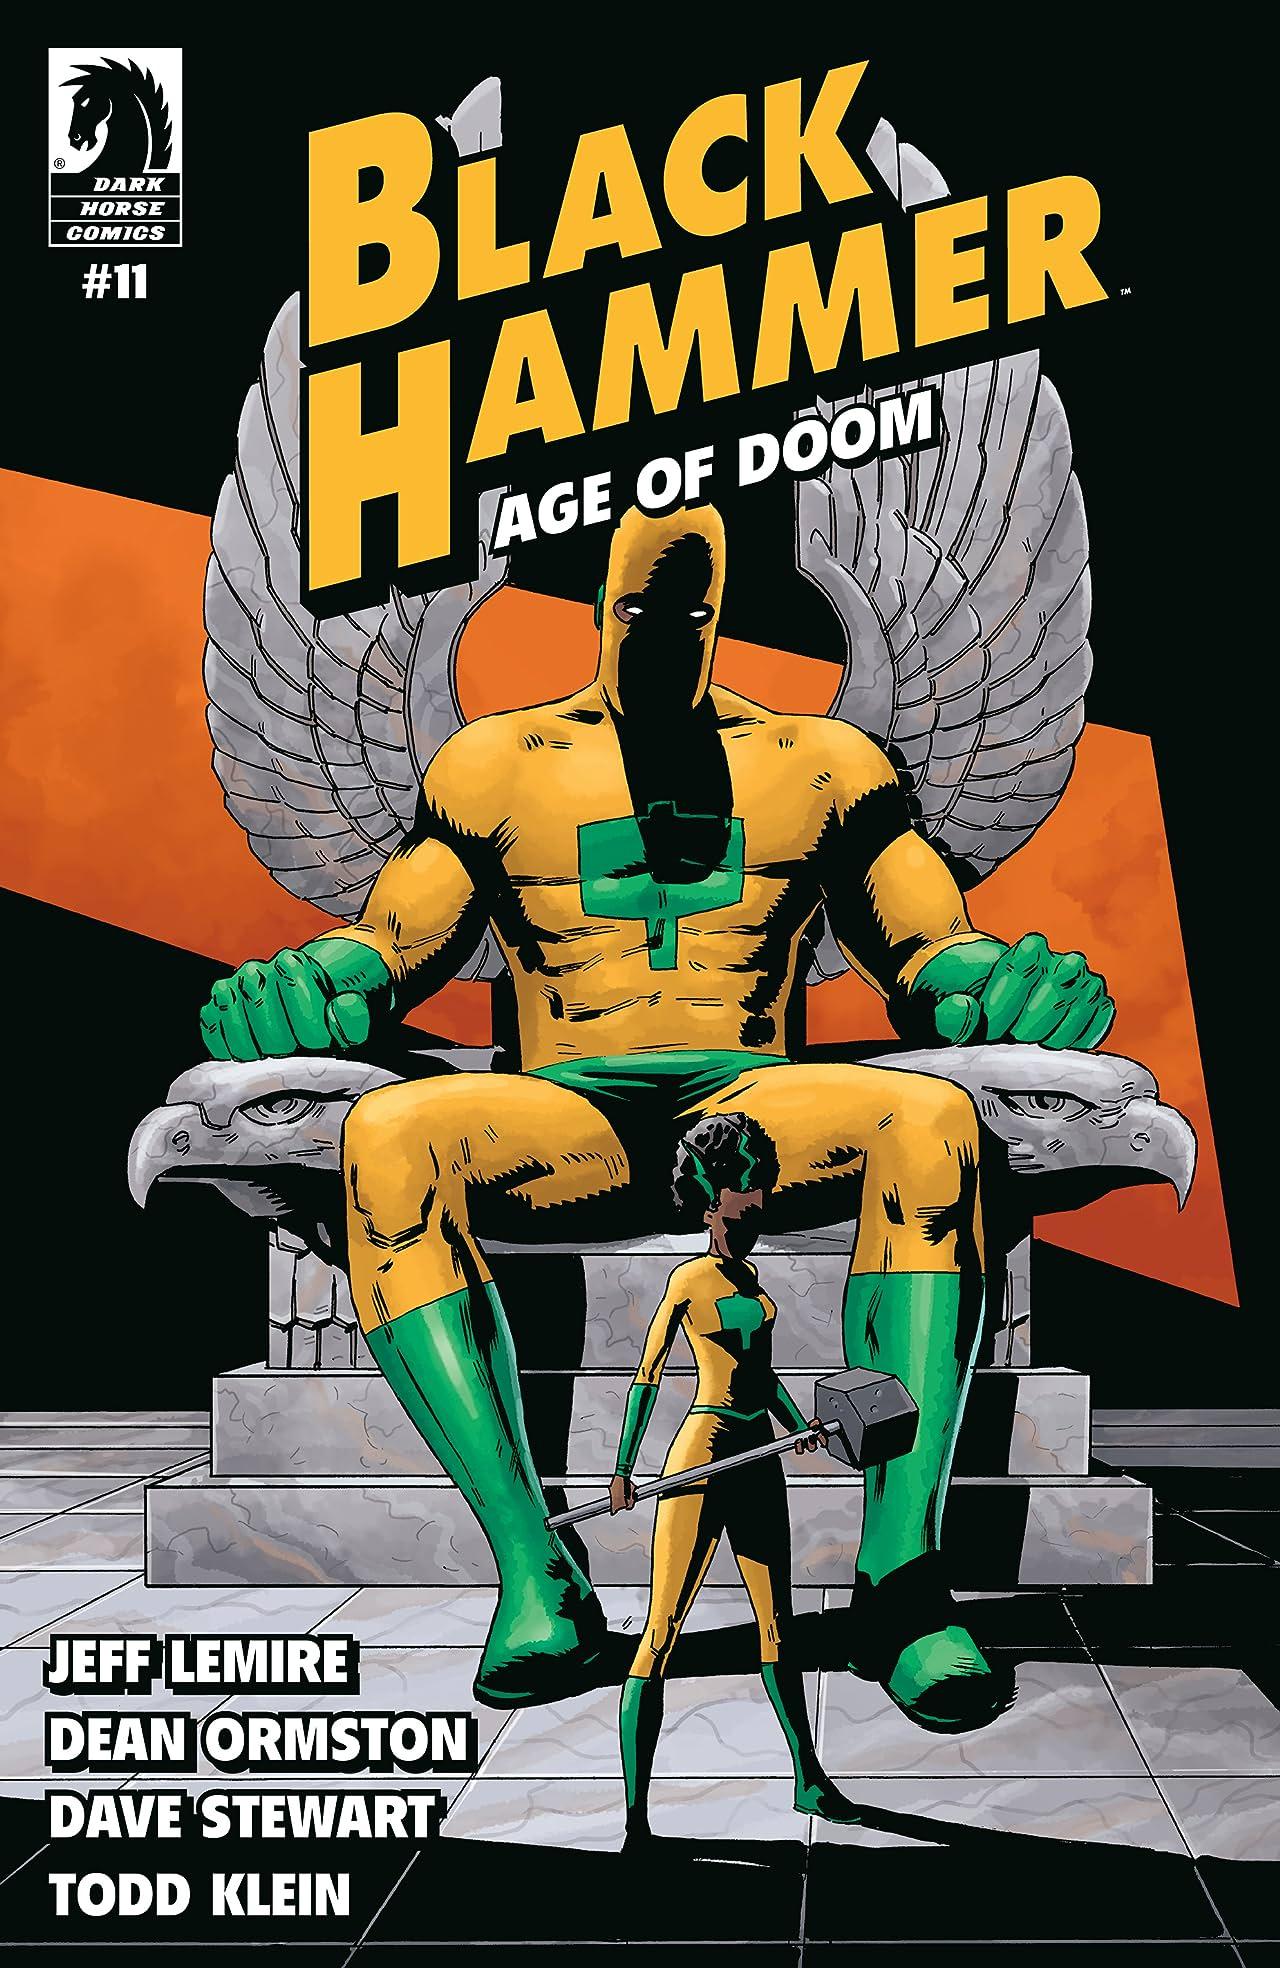 Black Hammer: Age of Doom #11